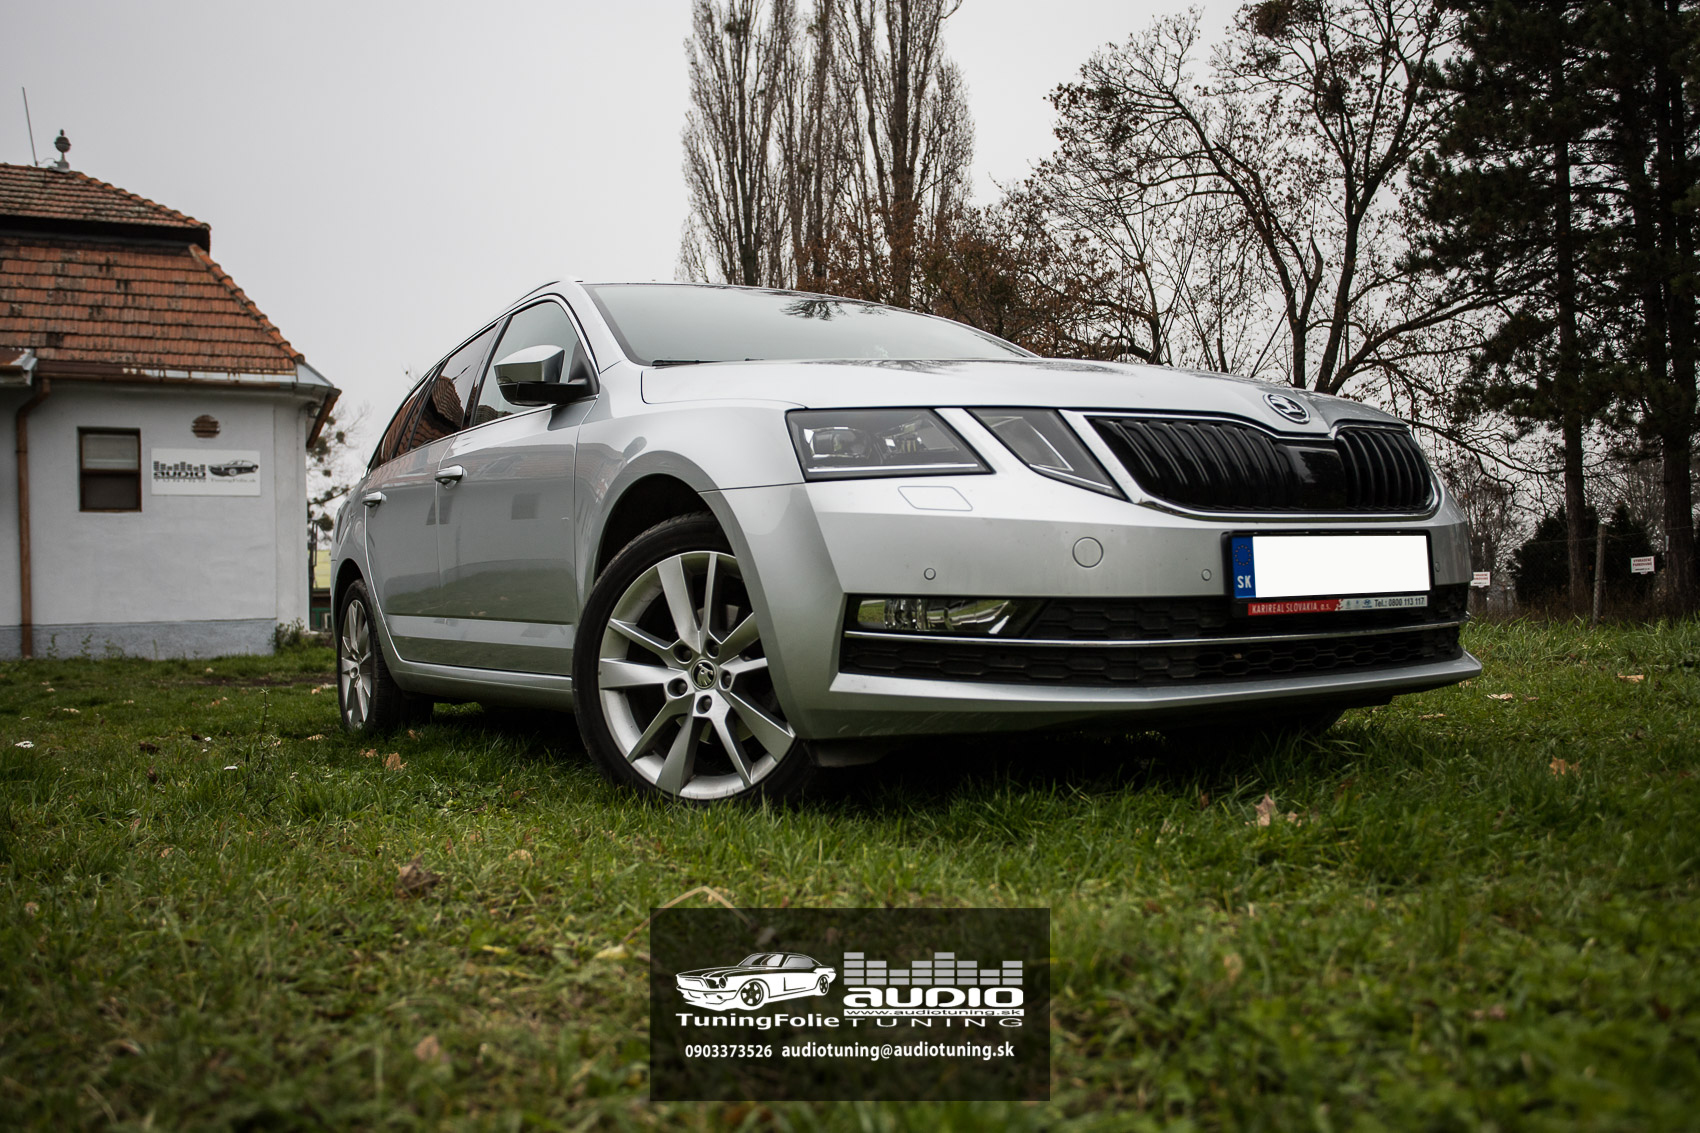 SKODA OCTAVIA SunTek Autofolie Premium-3619